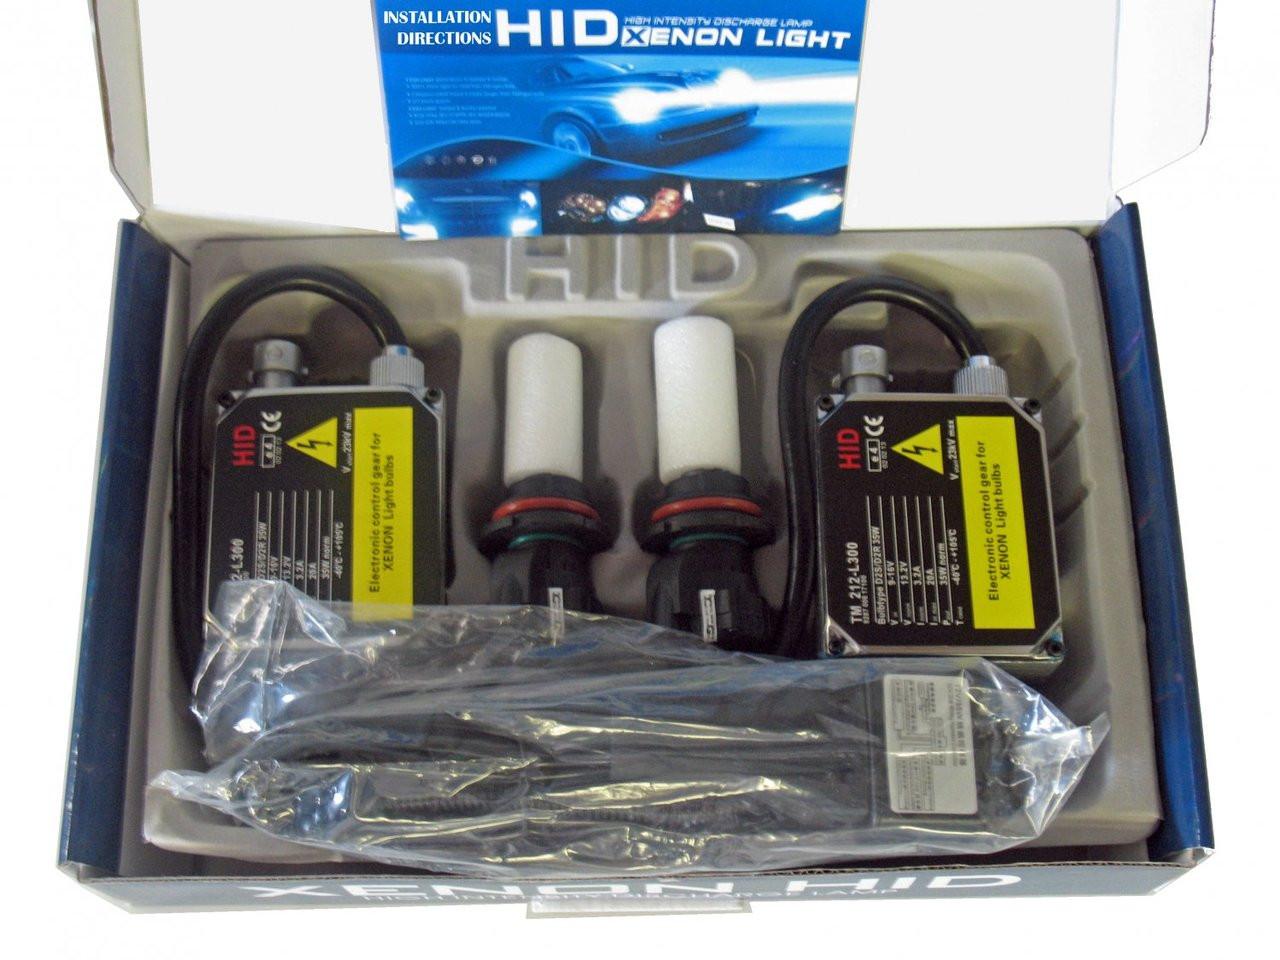 1990-1994 Nissan Sentra B13 Xenon HID Conversion Kit